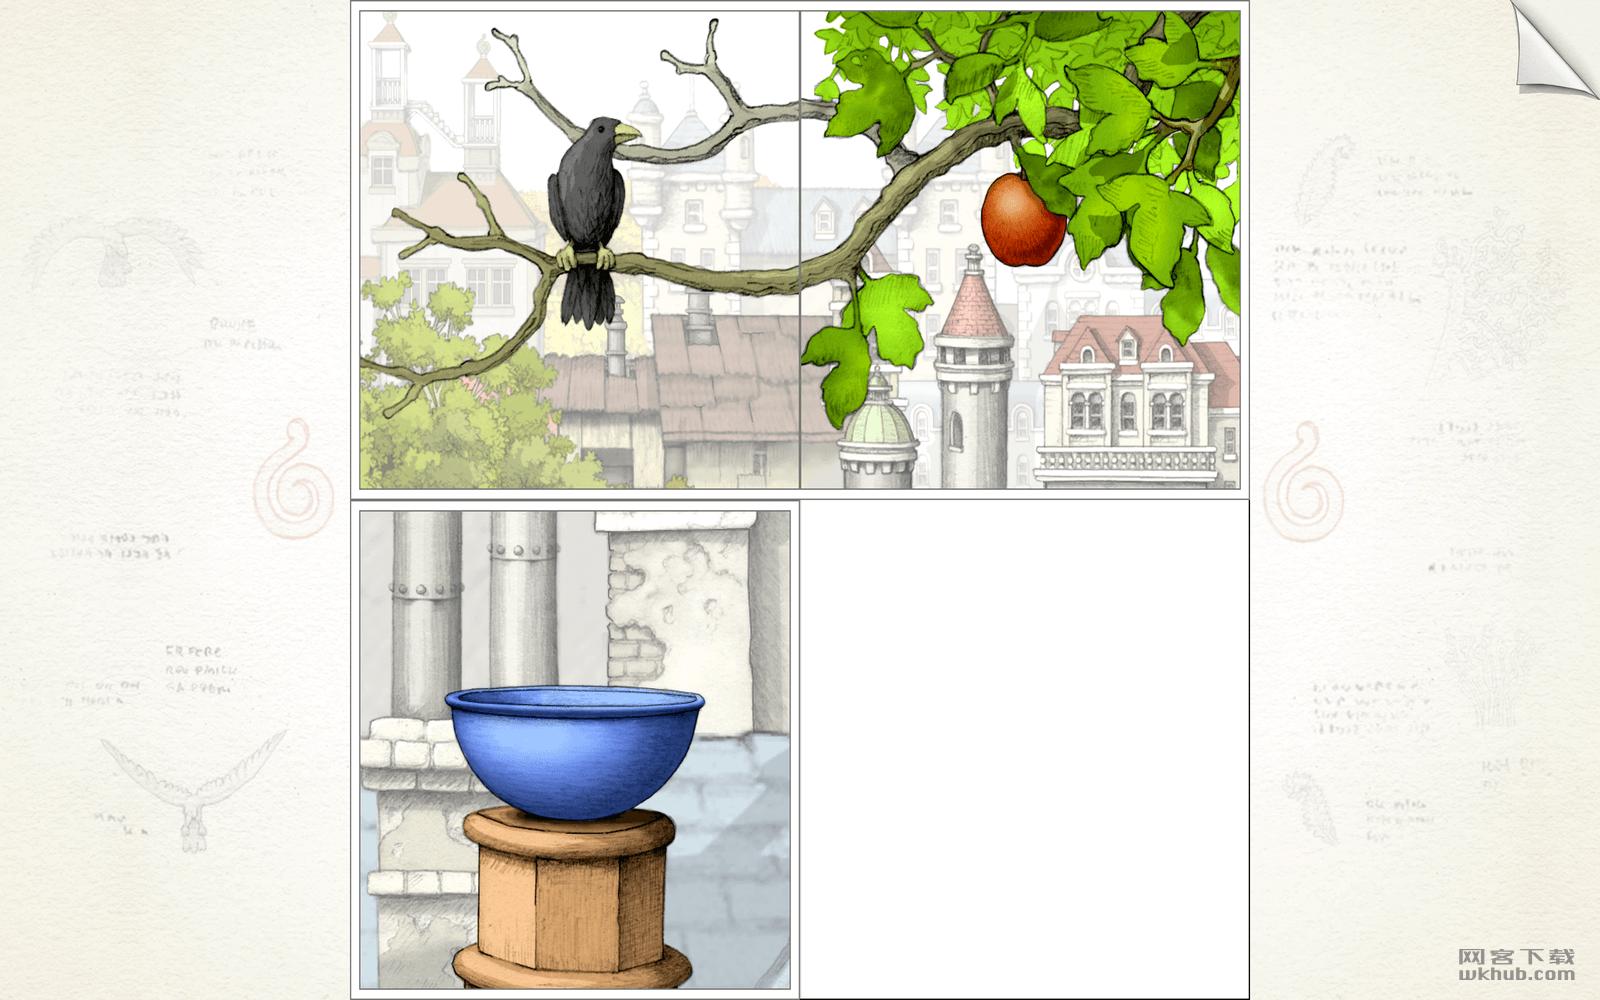 Gorogoa 1.1.0 画中世界